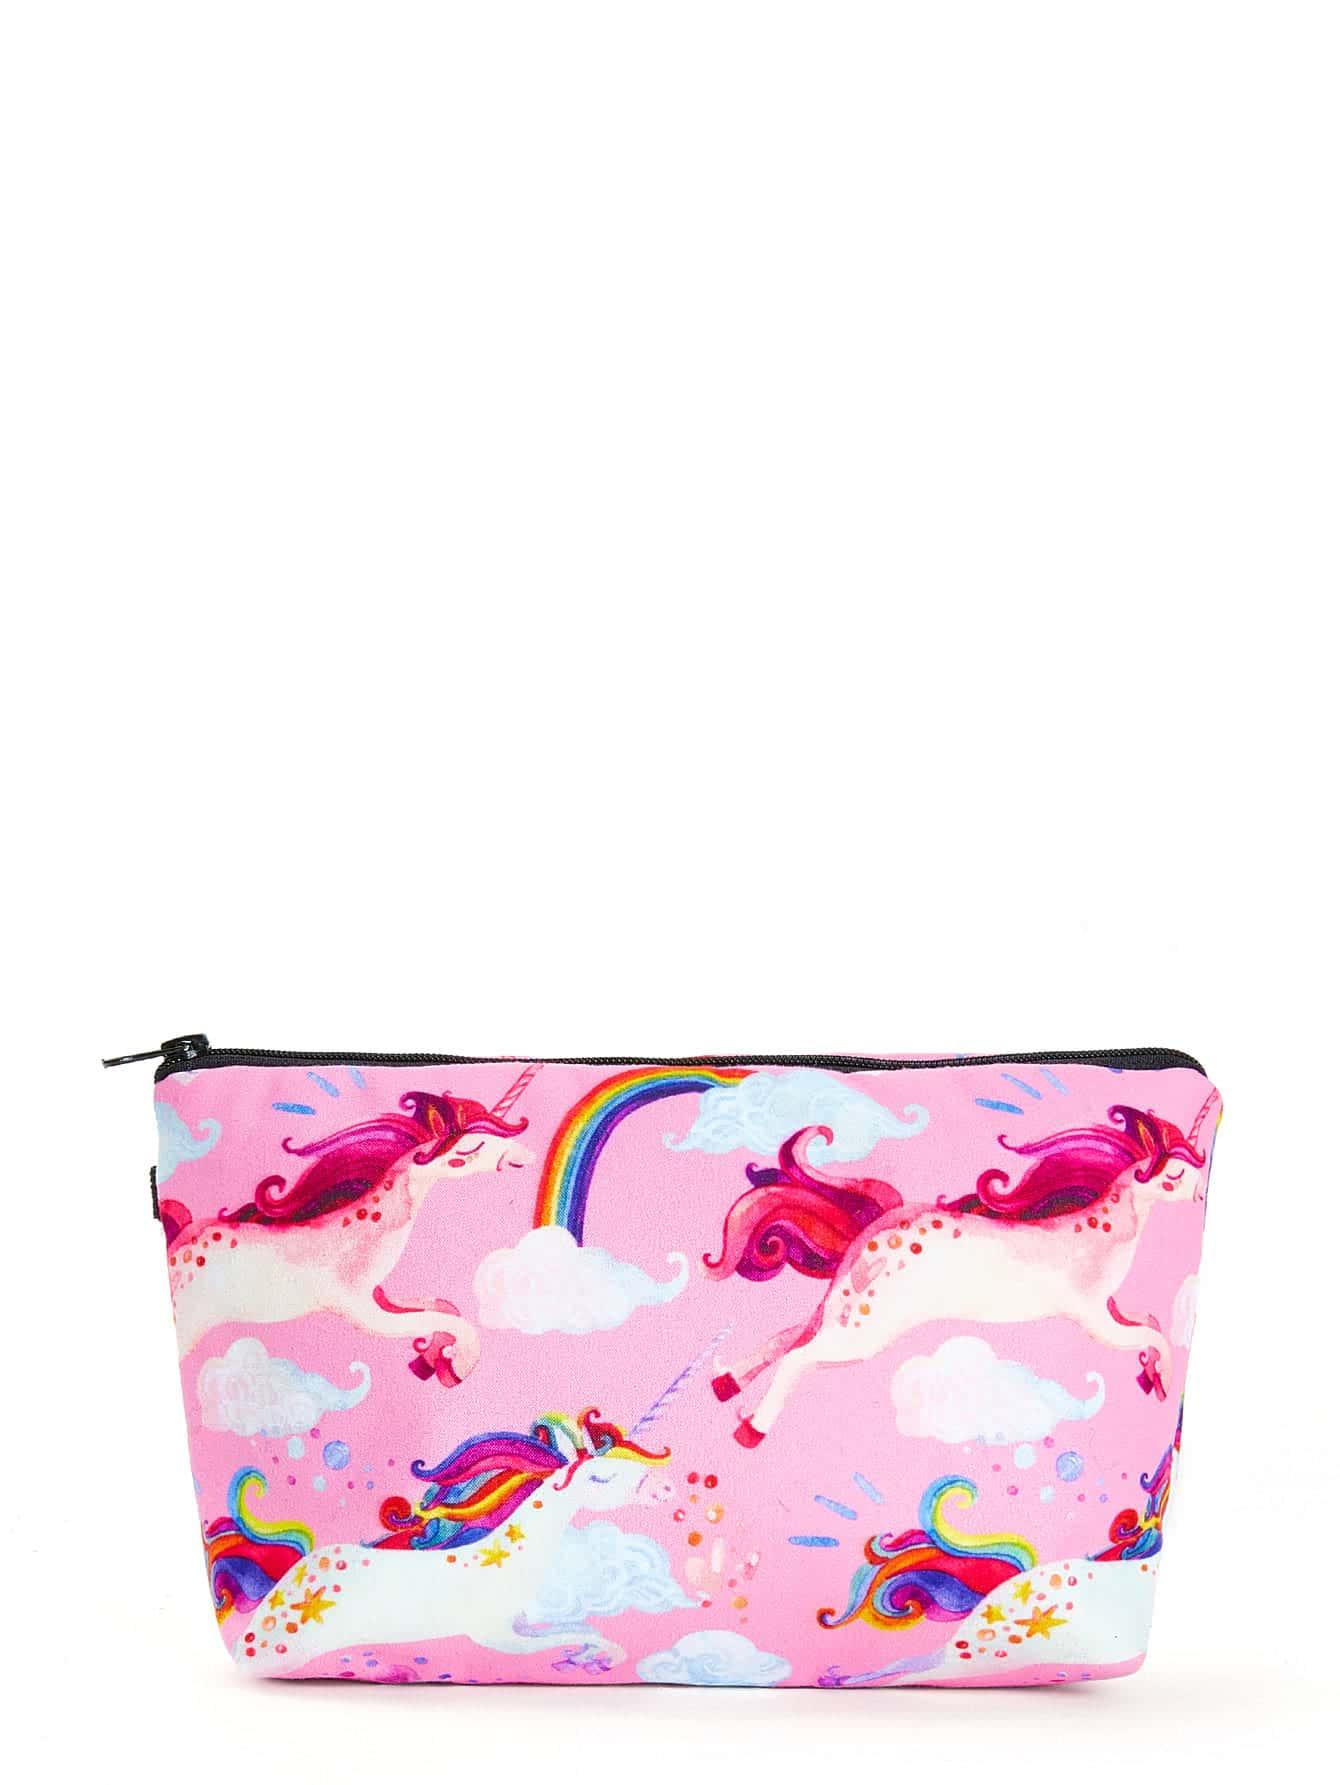 Unicorn & Rainbow Print Zipper Pouch